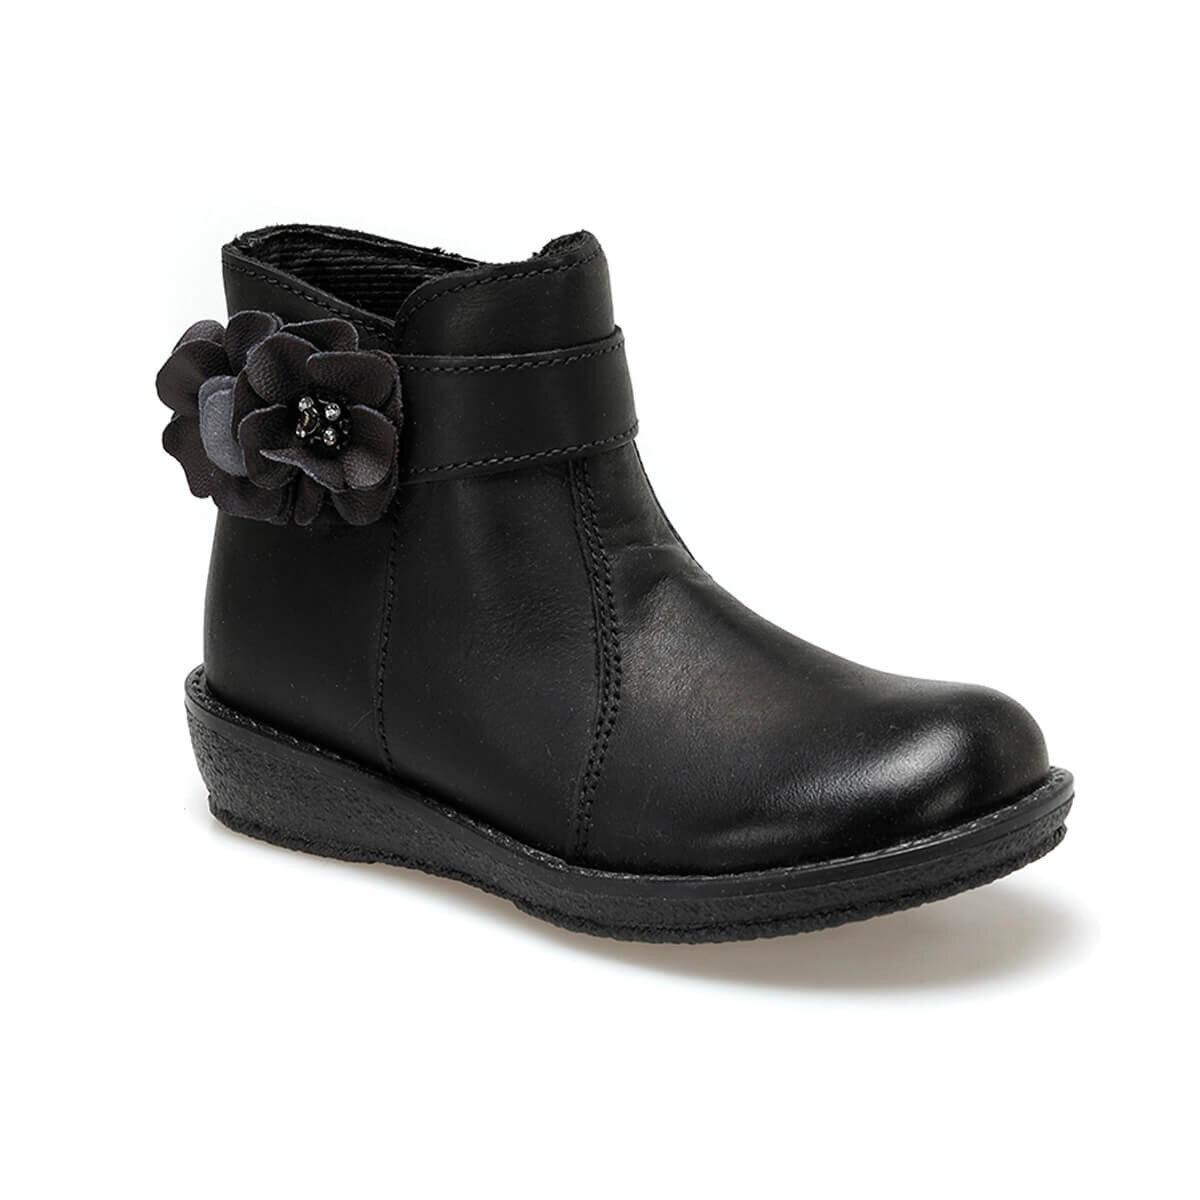 FLO 2323D4-S Black Female Child Boots Kifidis